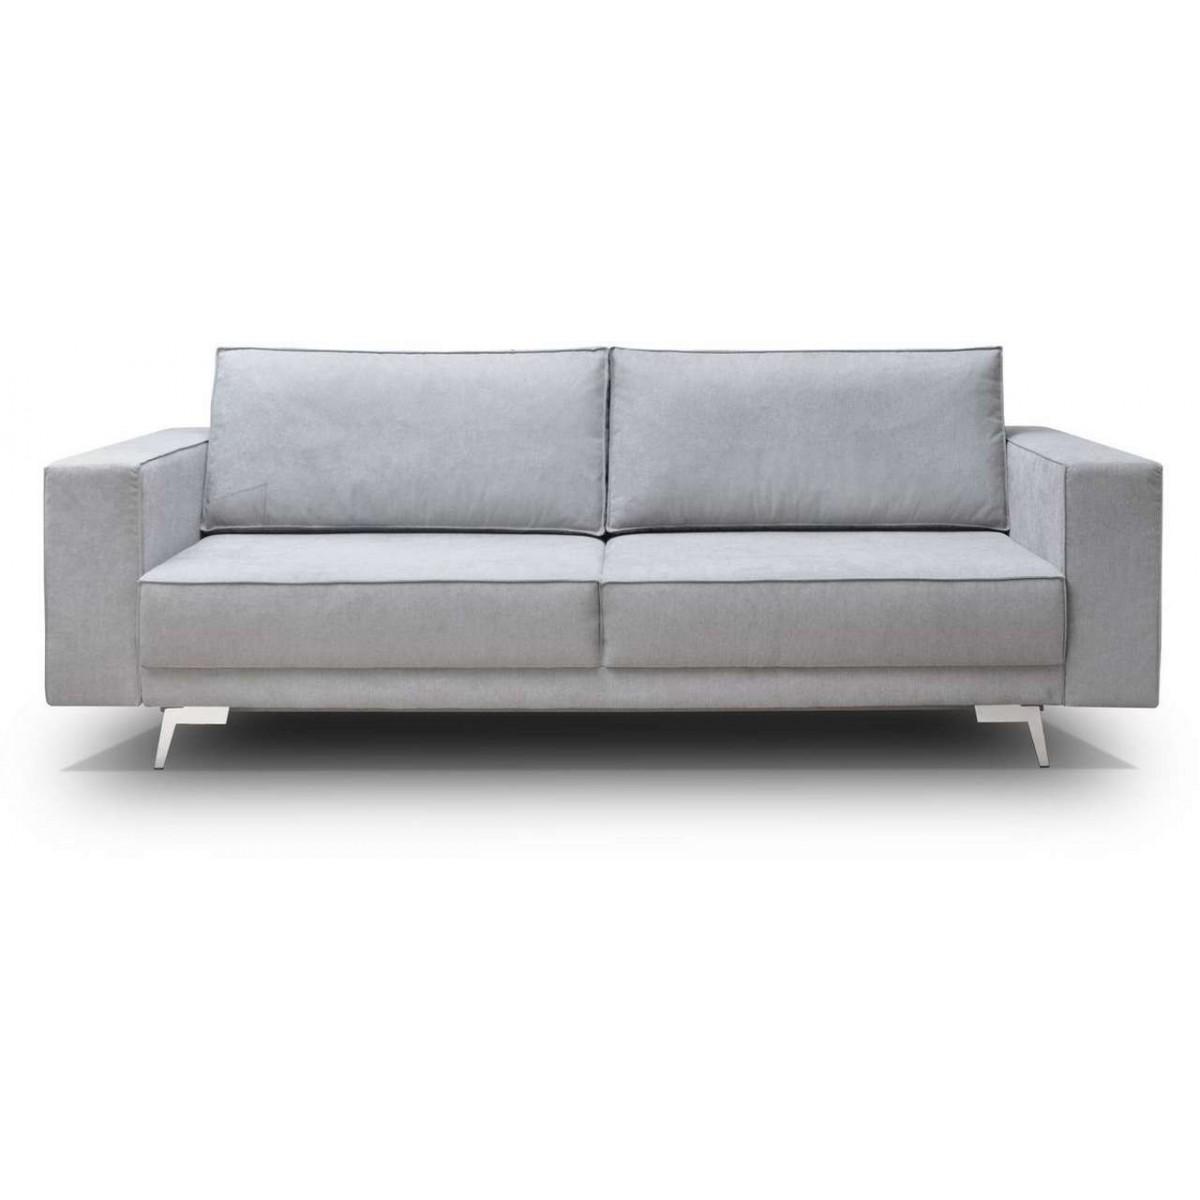 Malmo sofa 3 DL